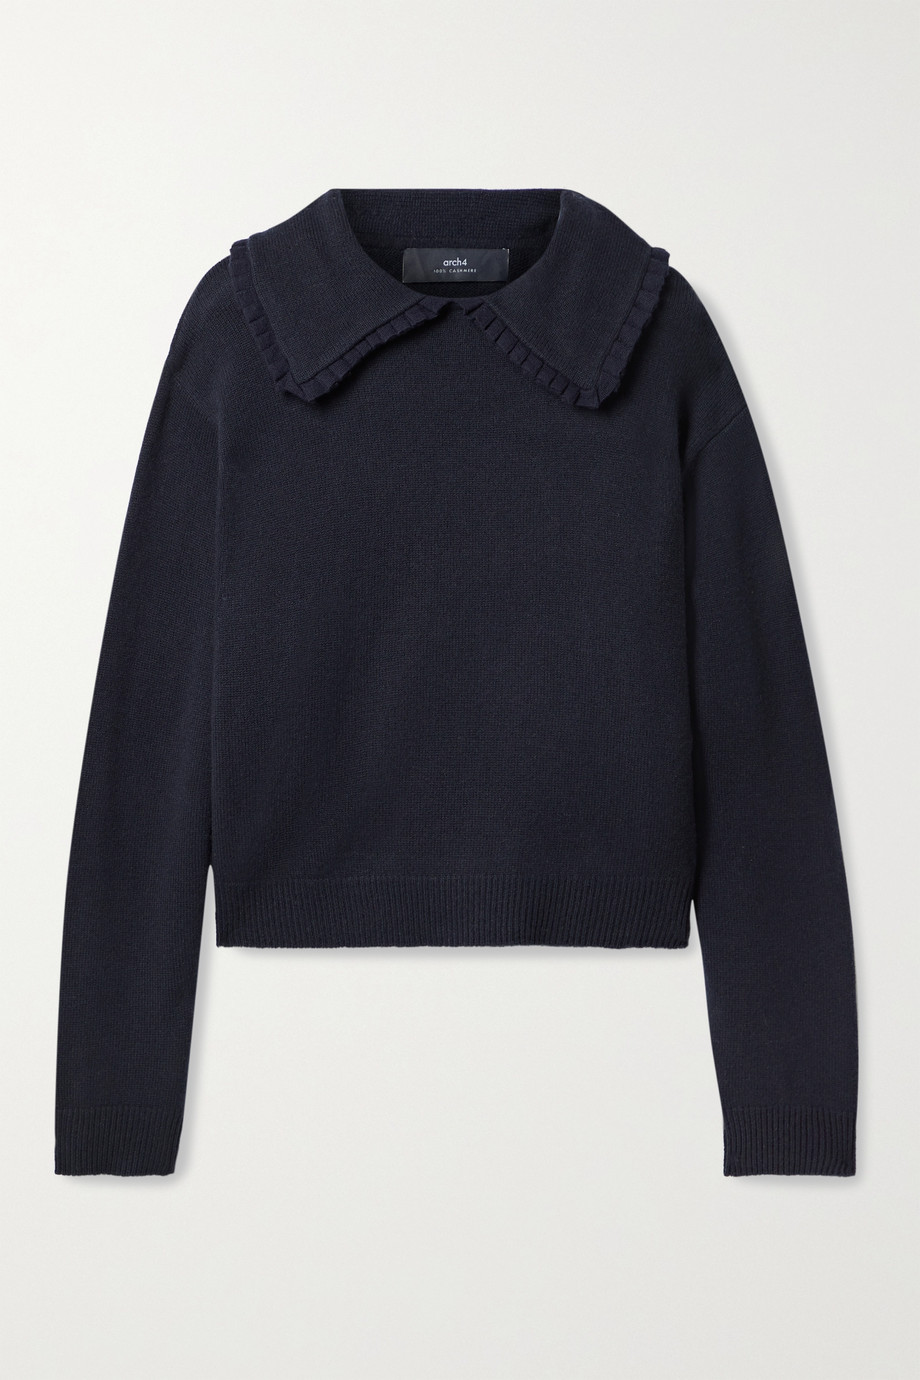 Arch4 Walton ruffled cashmere sweater